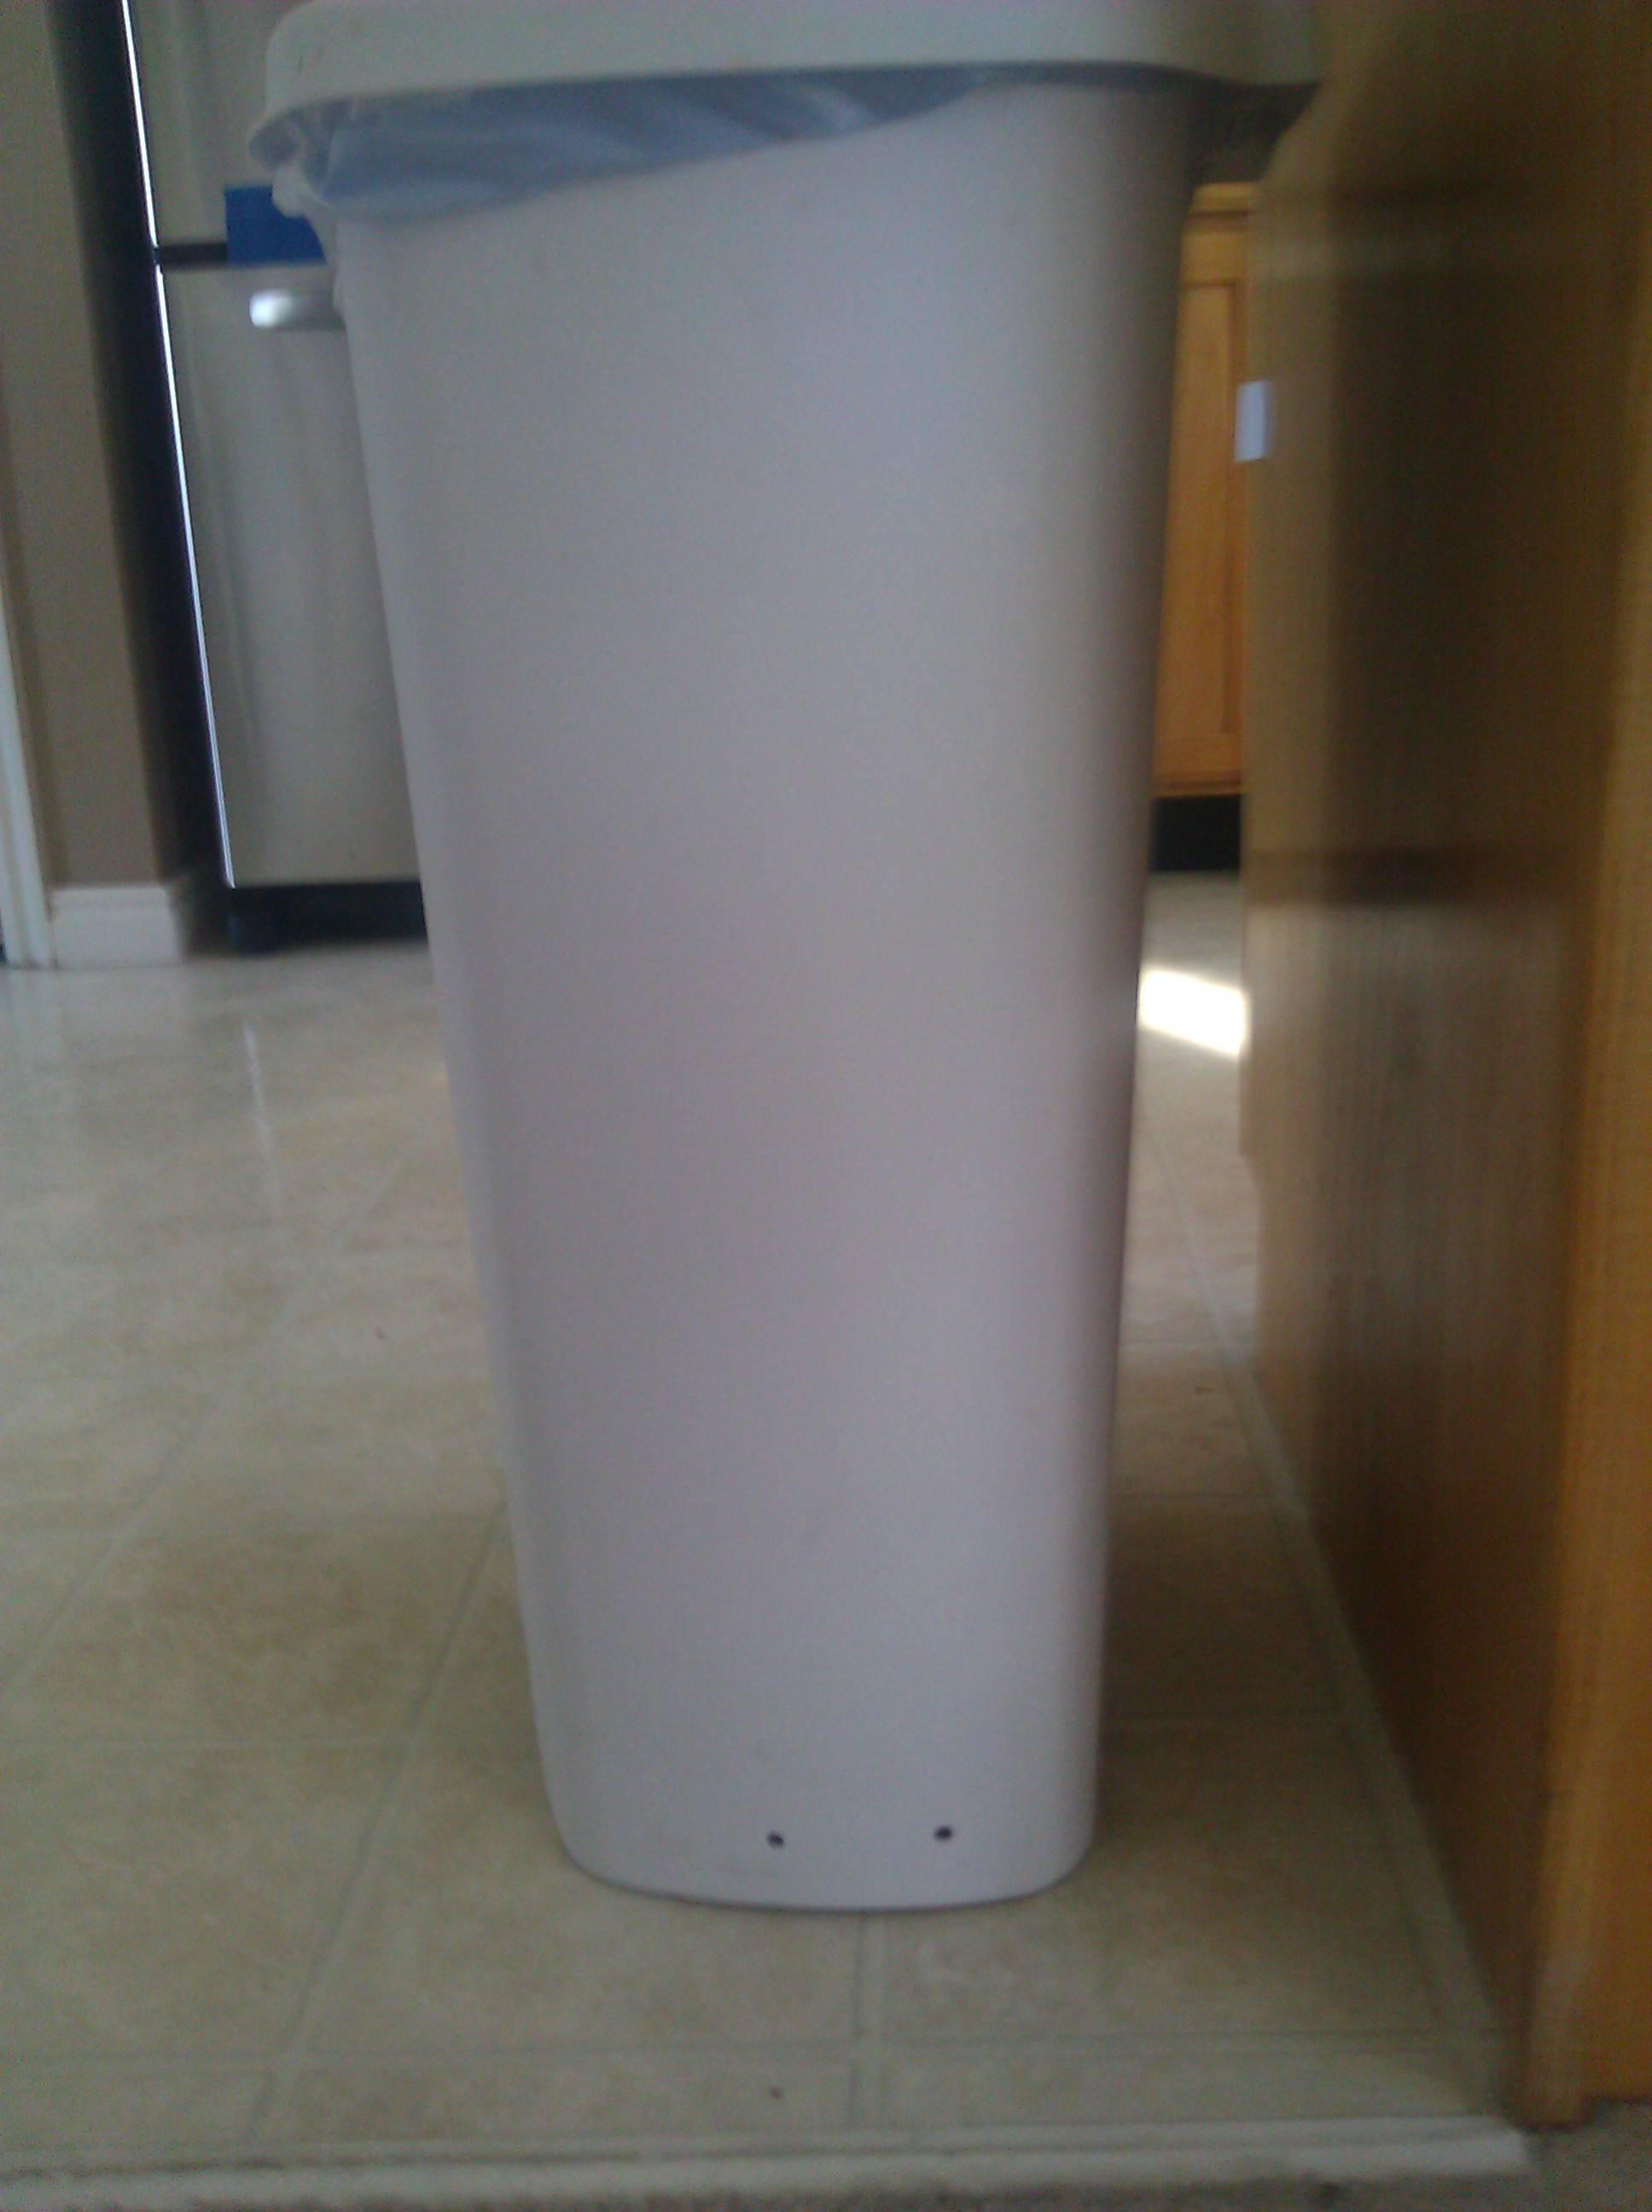 trash-can-hole-1554748994073.jpg